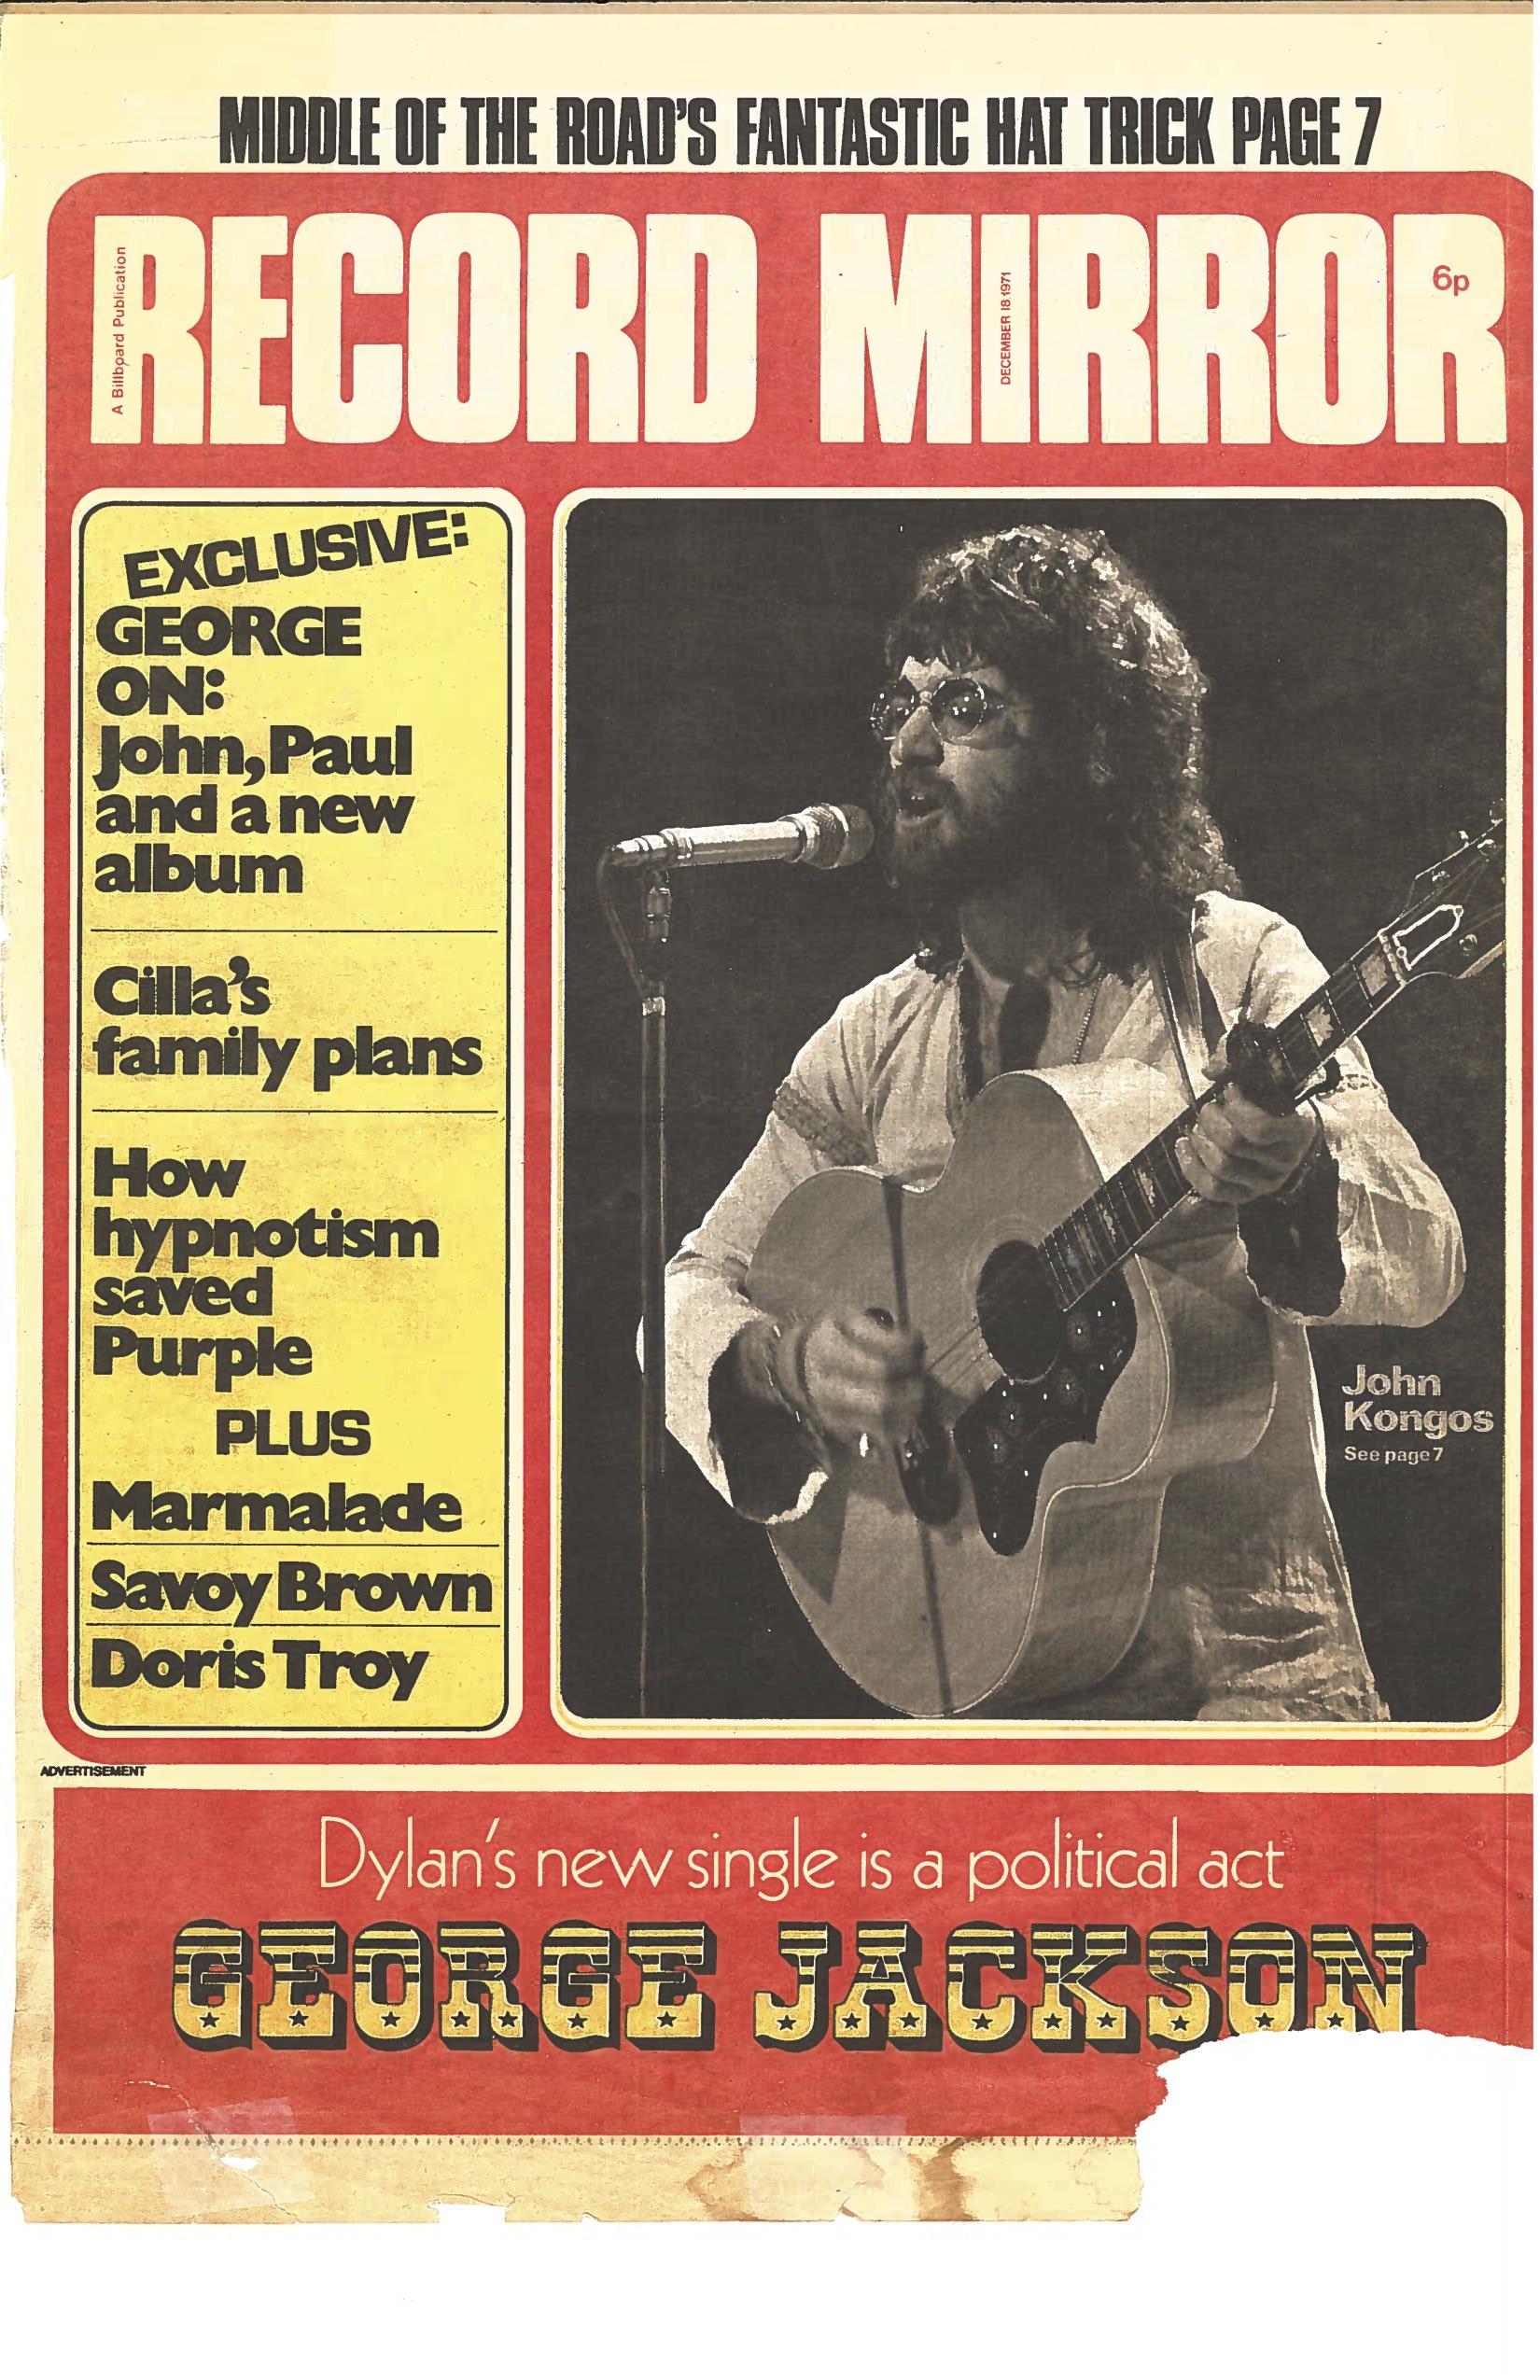 JOHN 1972 LONDON.jpg